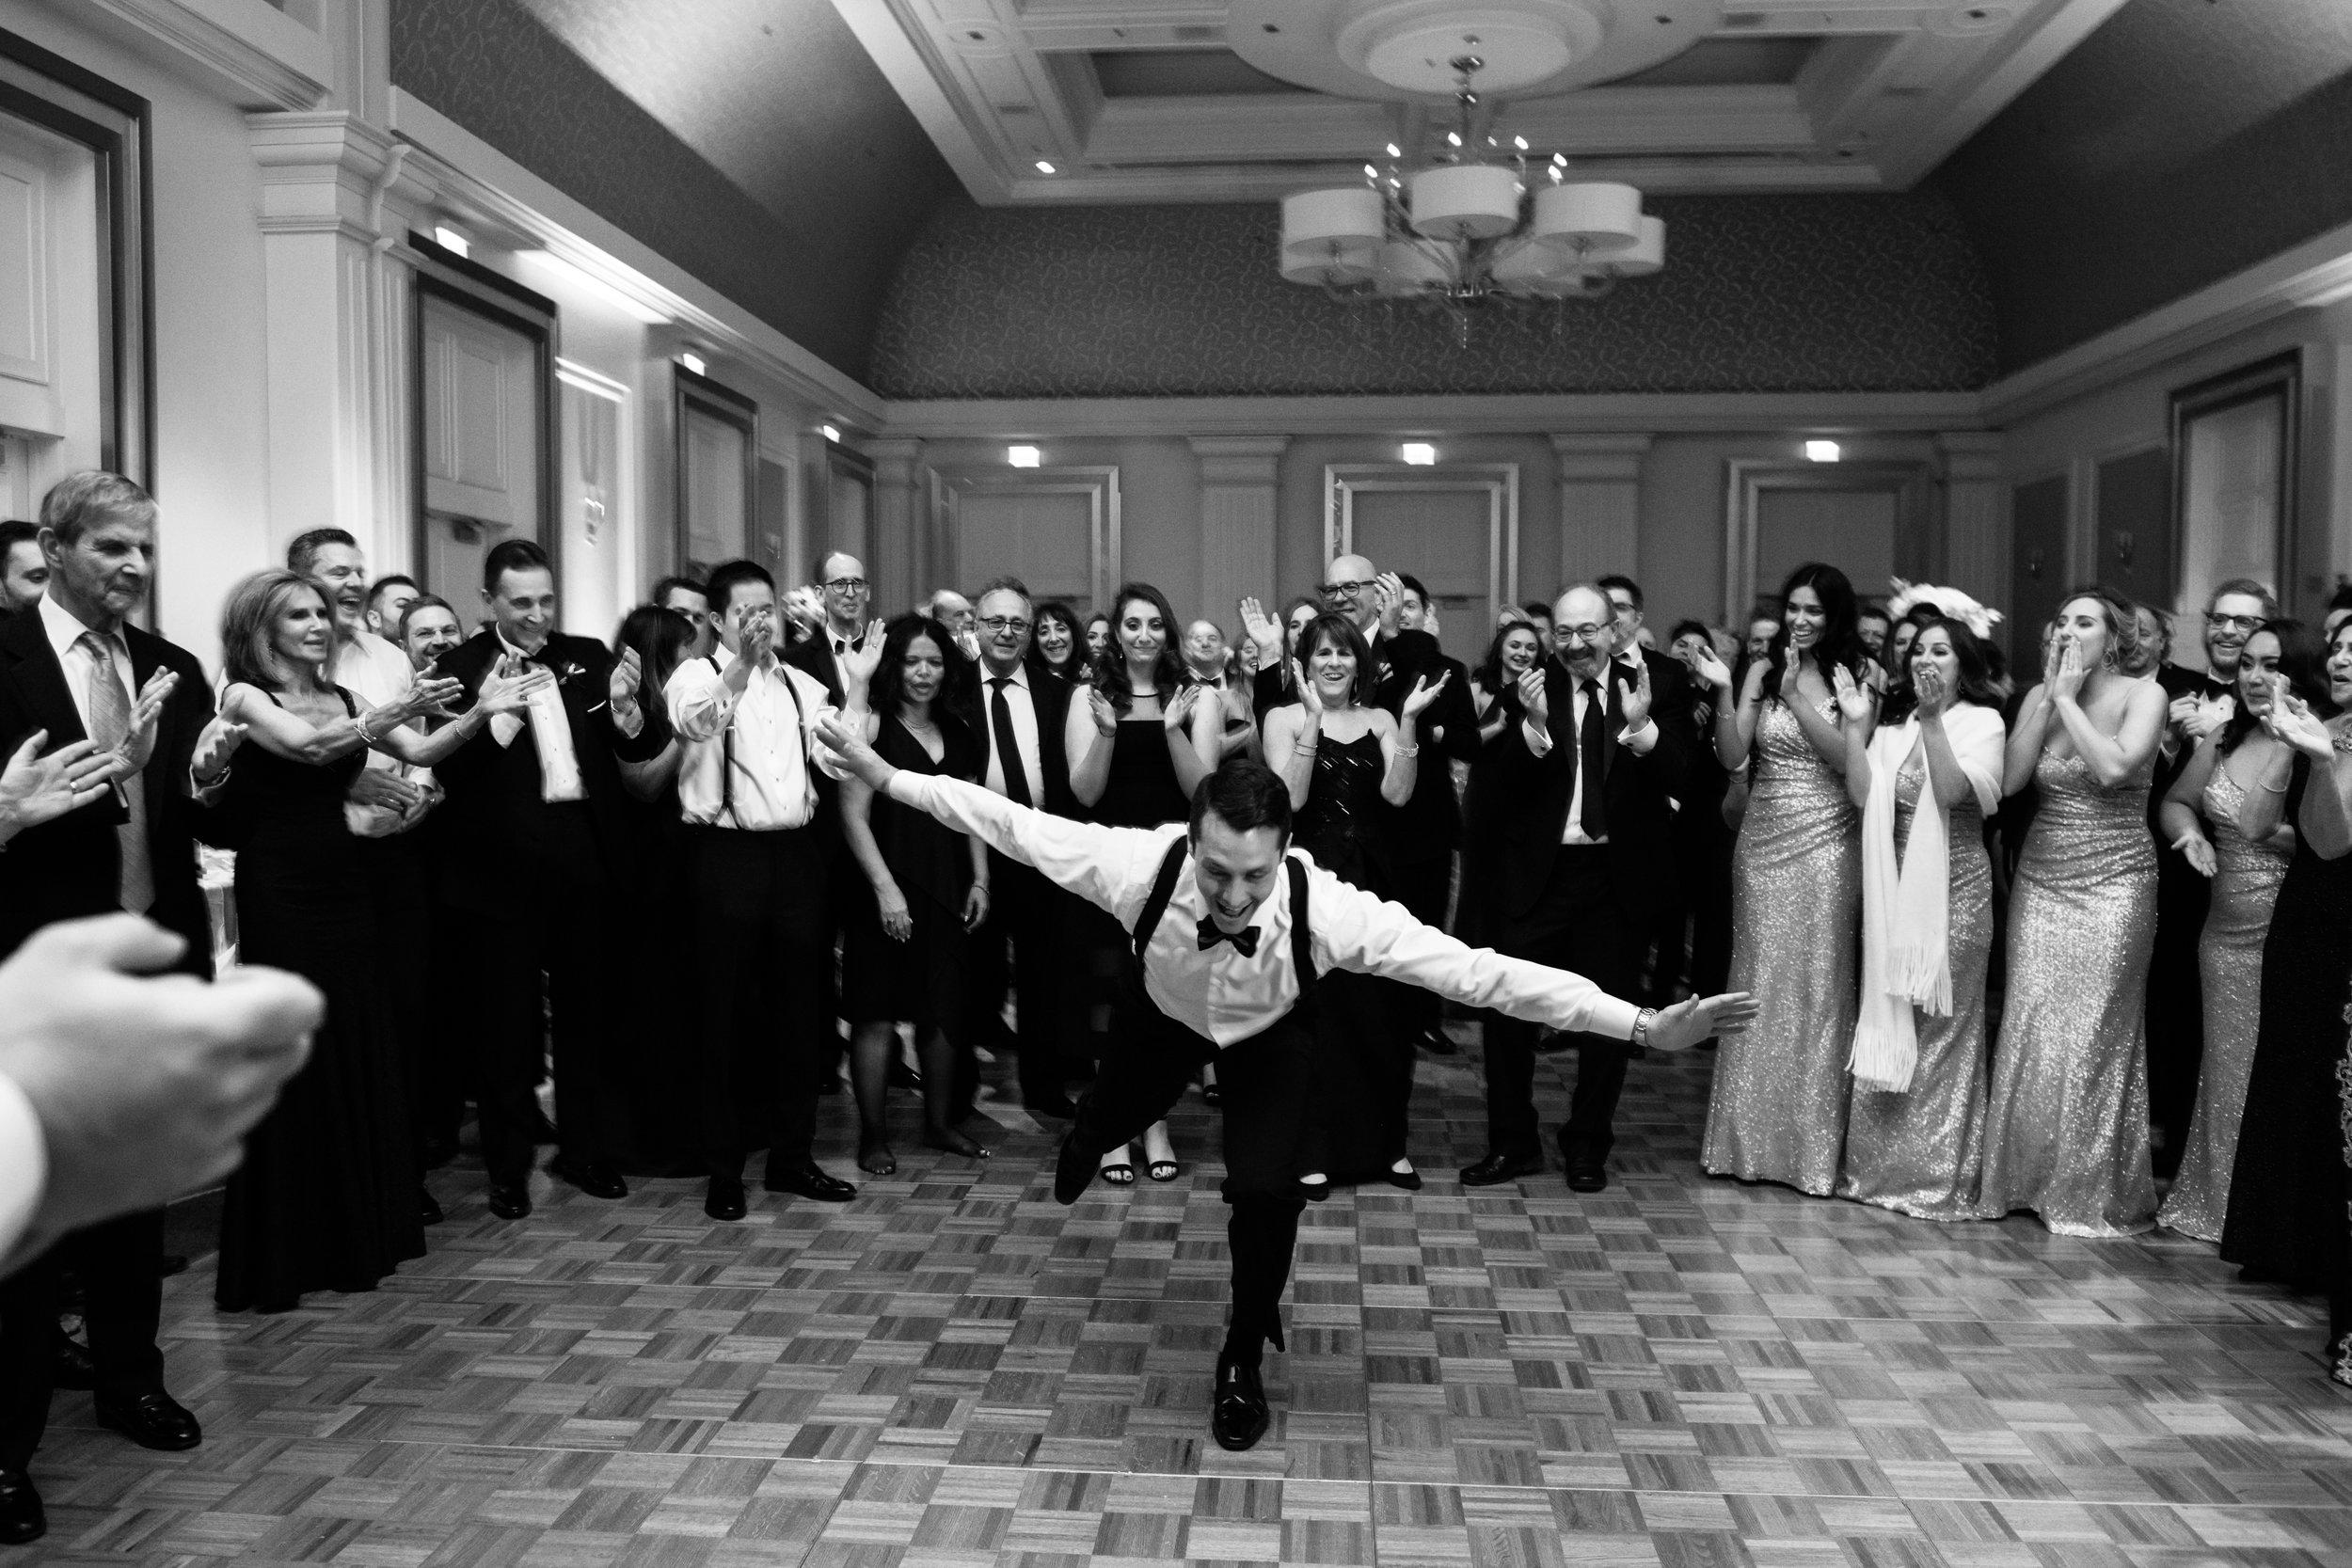 Elegant wedding at the JW Marriott Chicago36.jpg